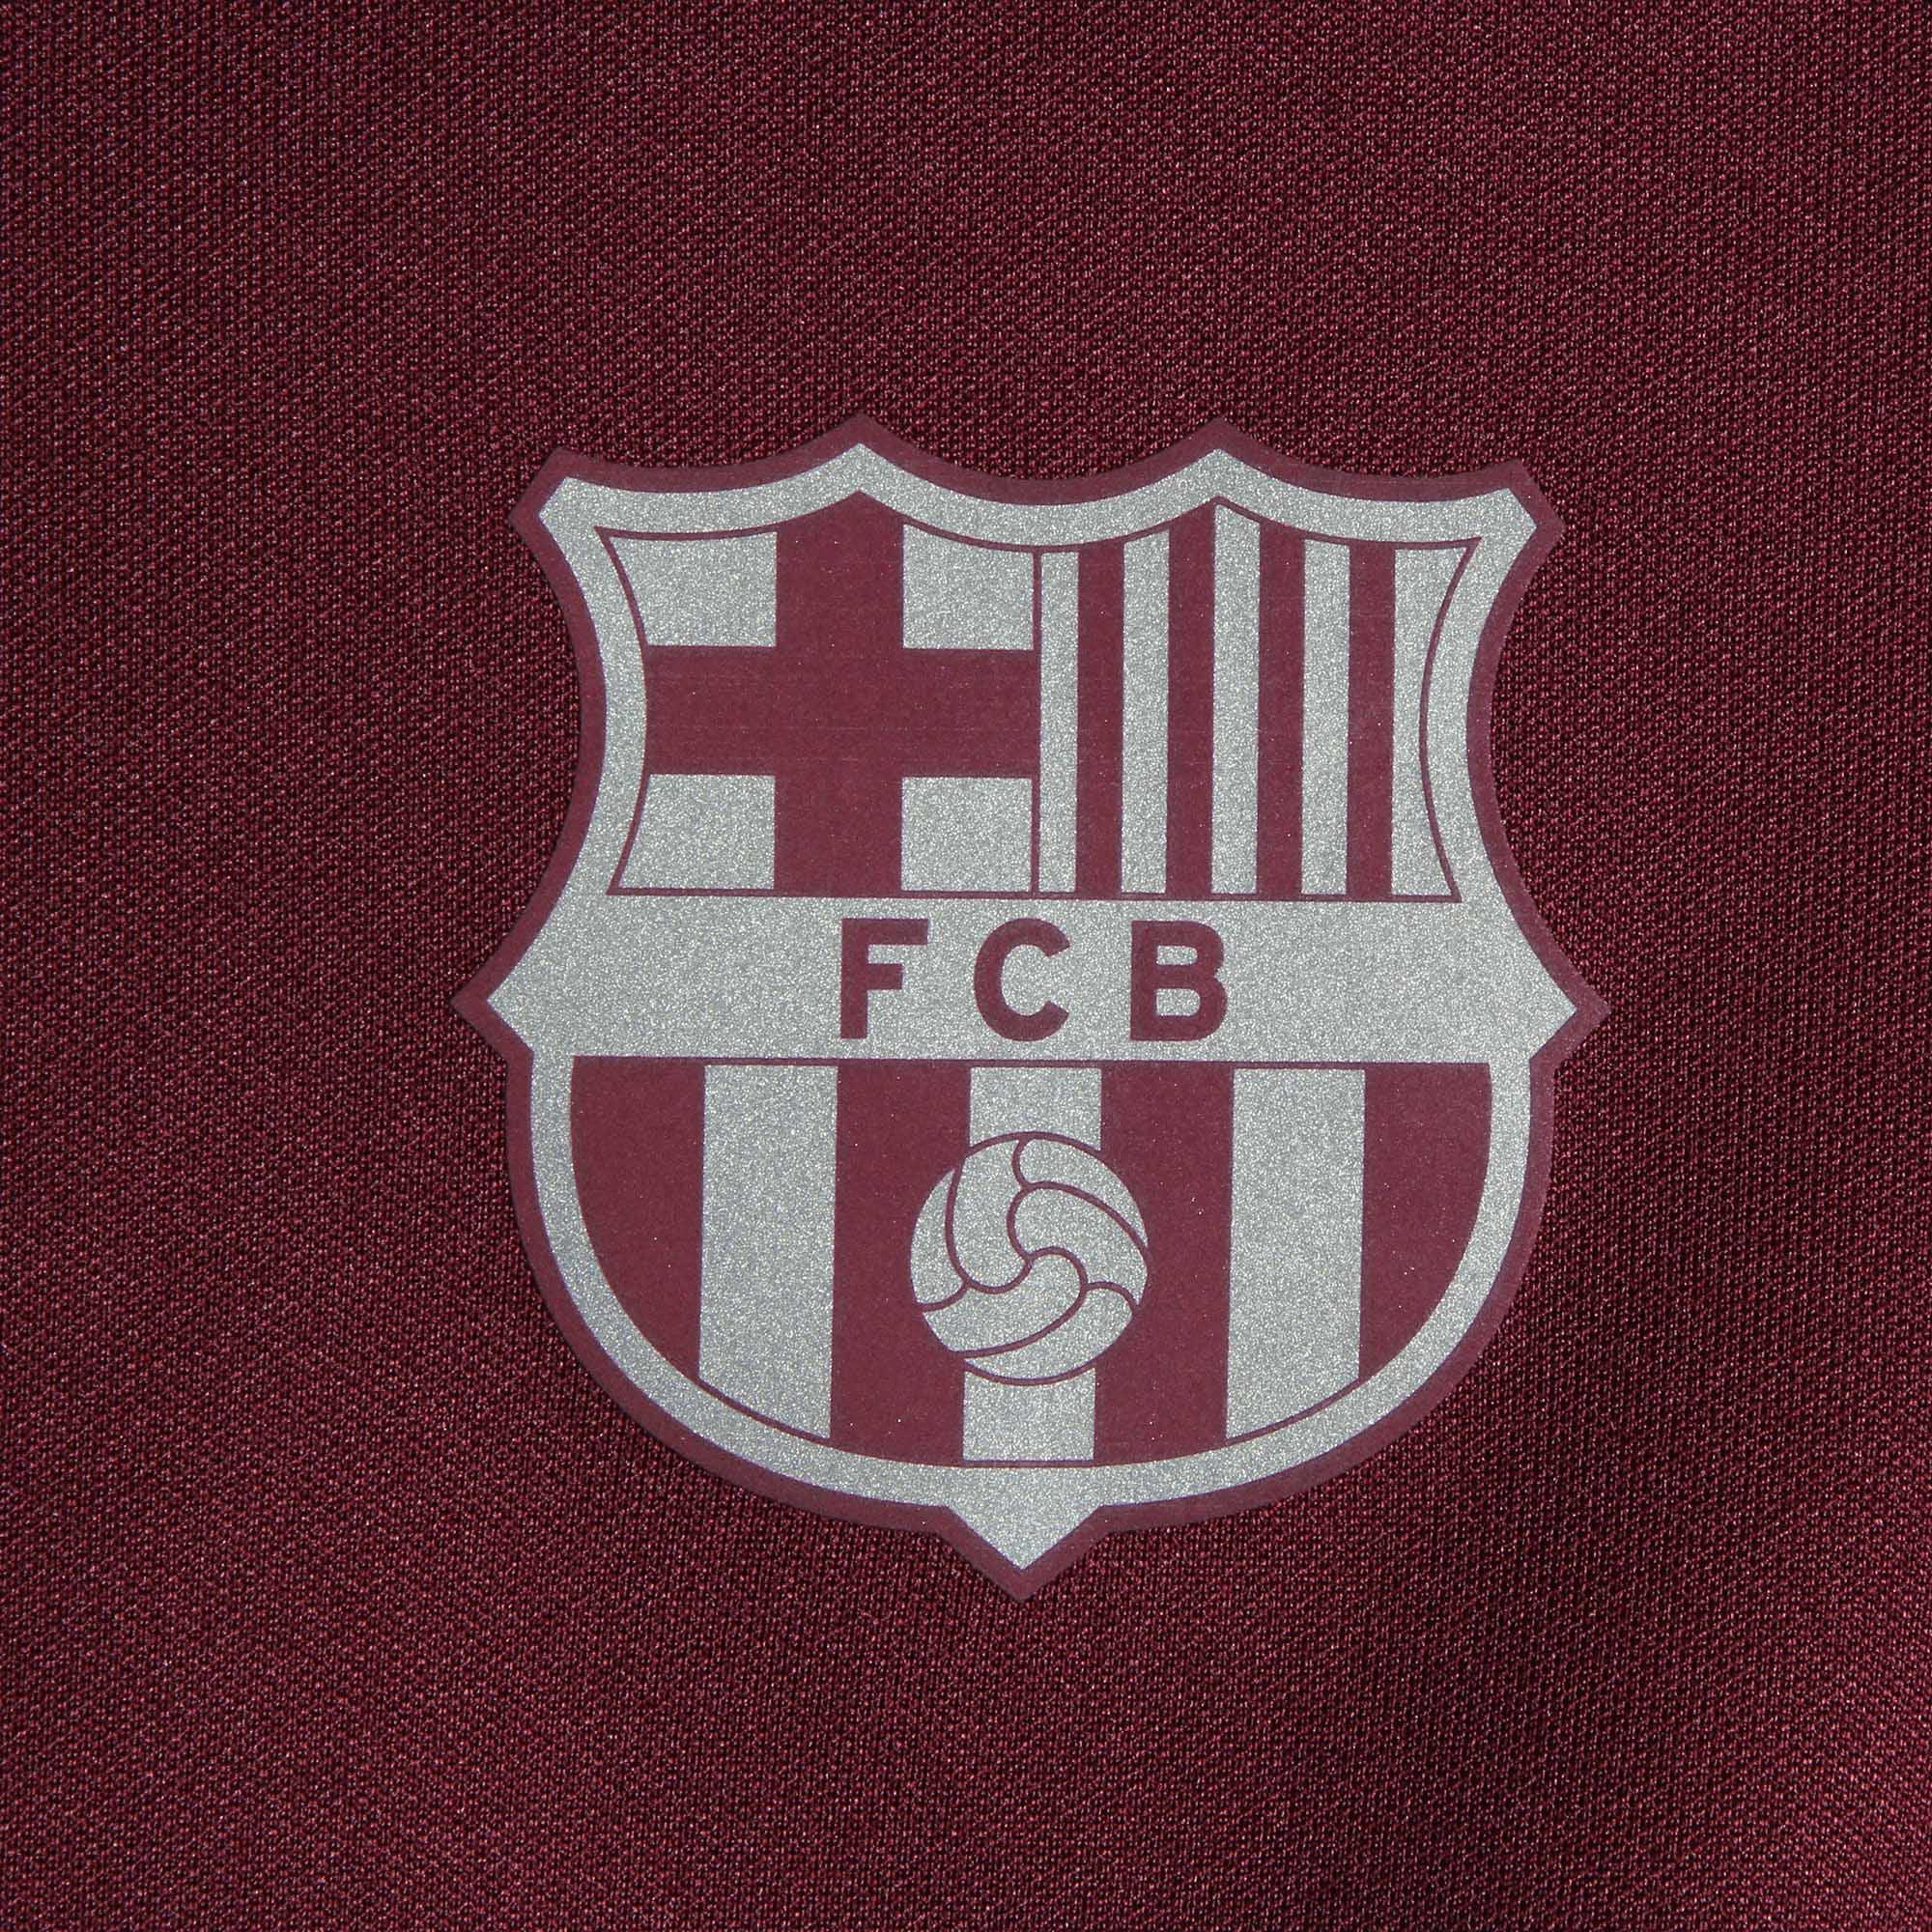 4ebed2b19 Nike - Barcelona Nike Youth Fall 2018 19 UEFA Champions League Anthem  Raglan Full-Zip Performance Jacket - Burgundy - Walmart.com